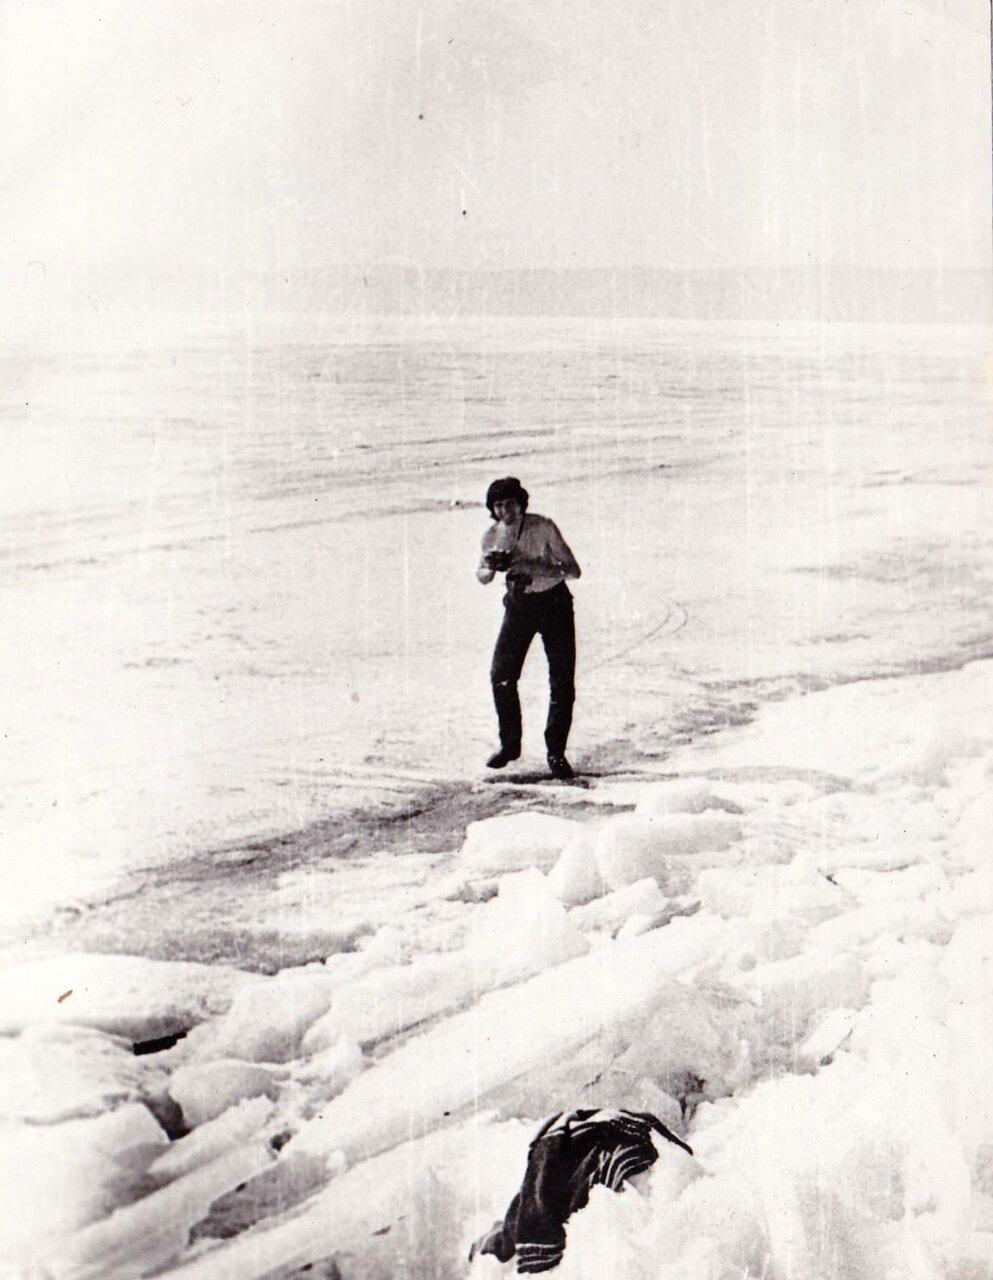 1989. март. На Байкале. Валера Рожков во льдах